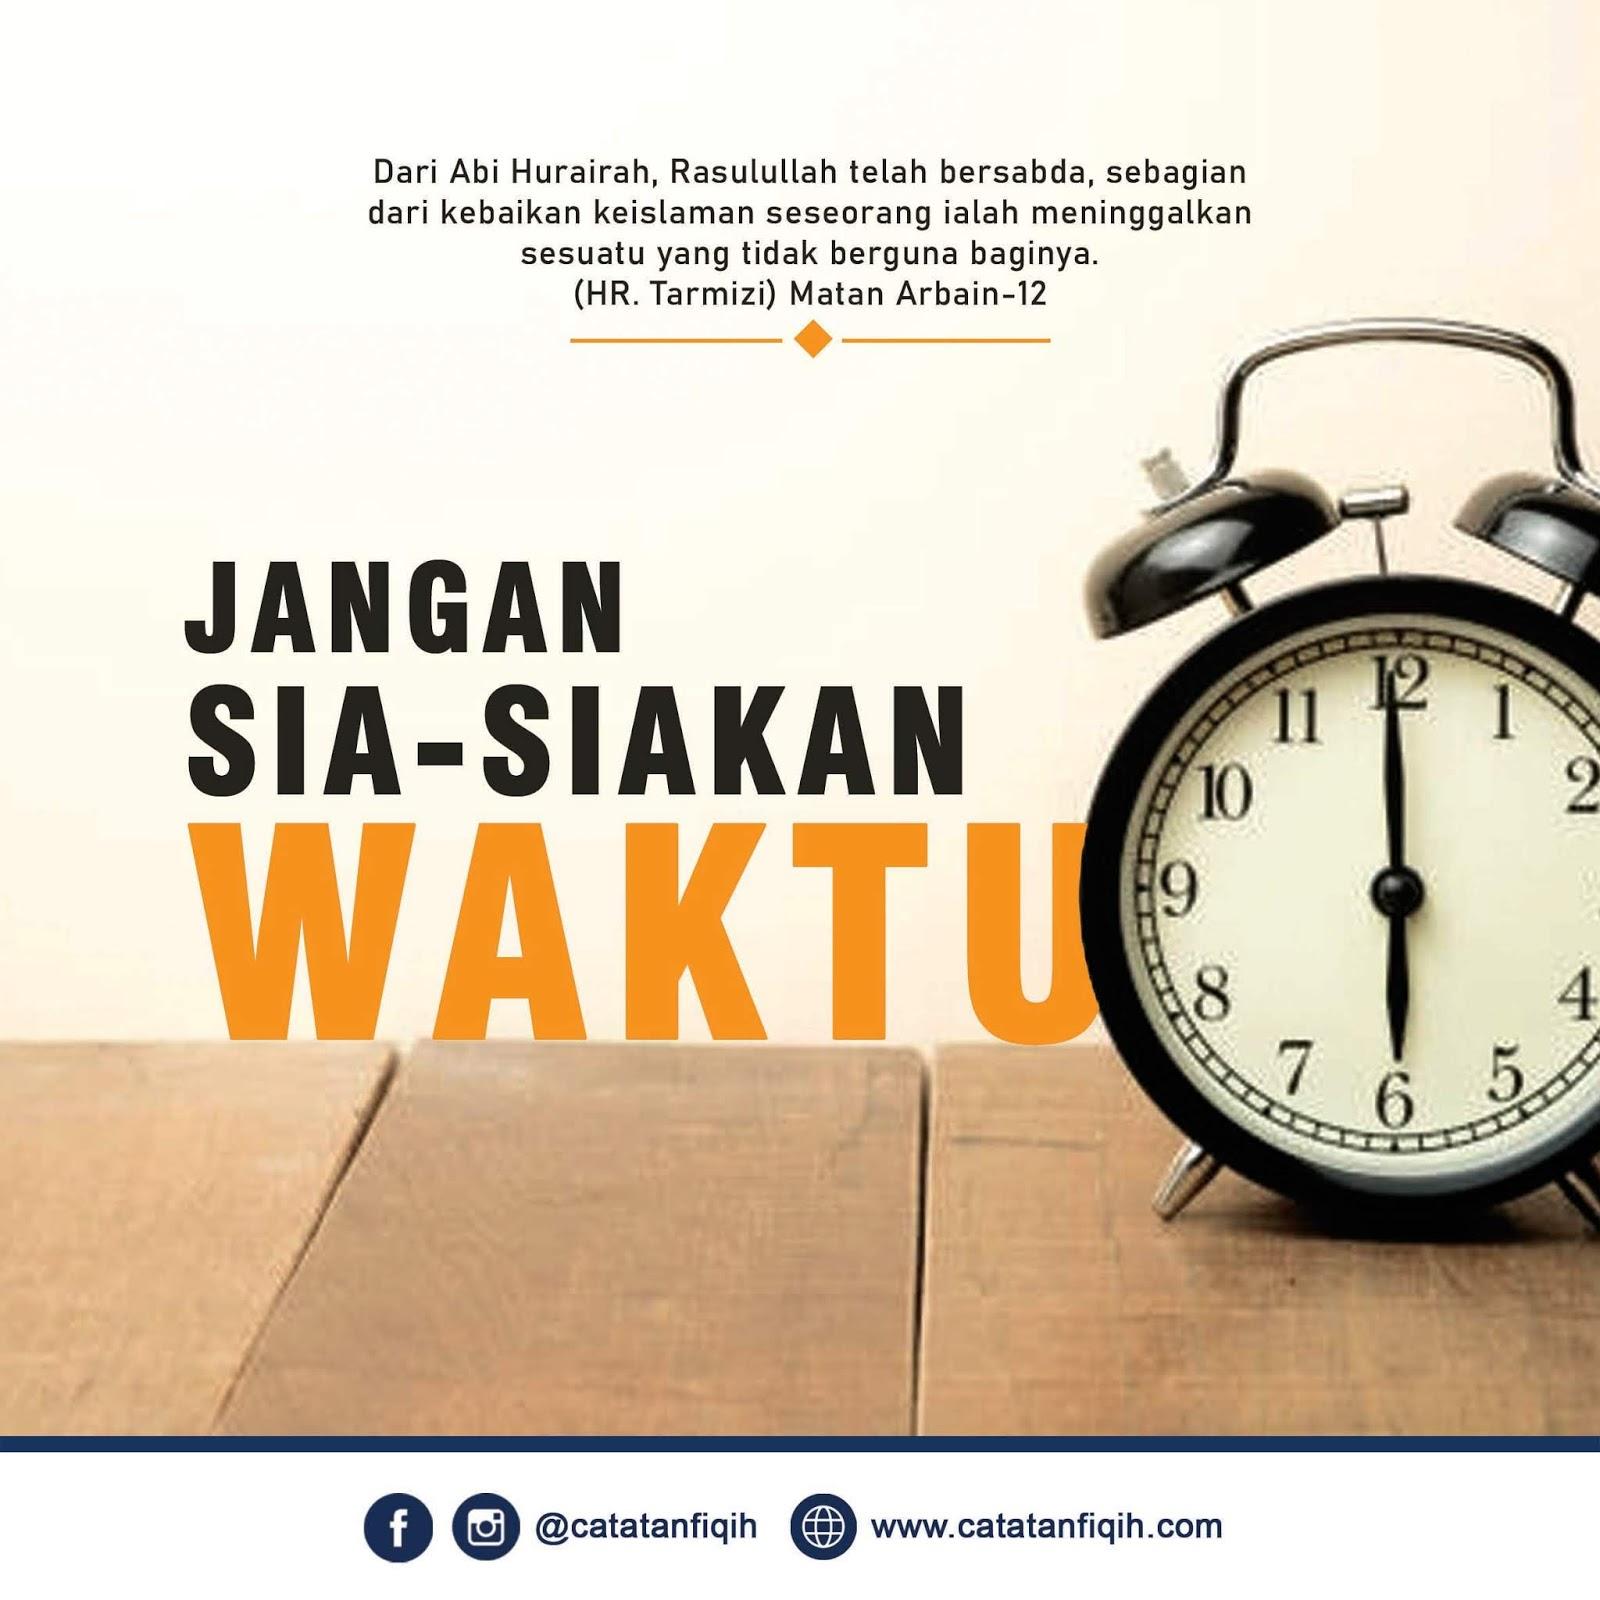 Jangan Sia-Siakan Waktu